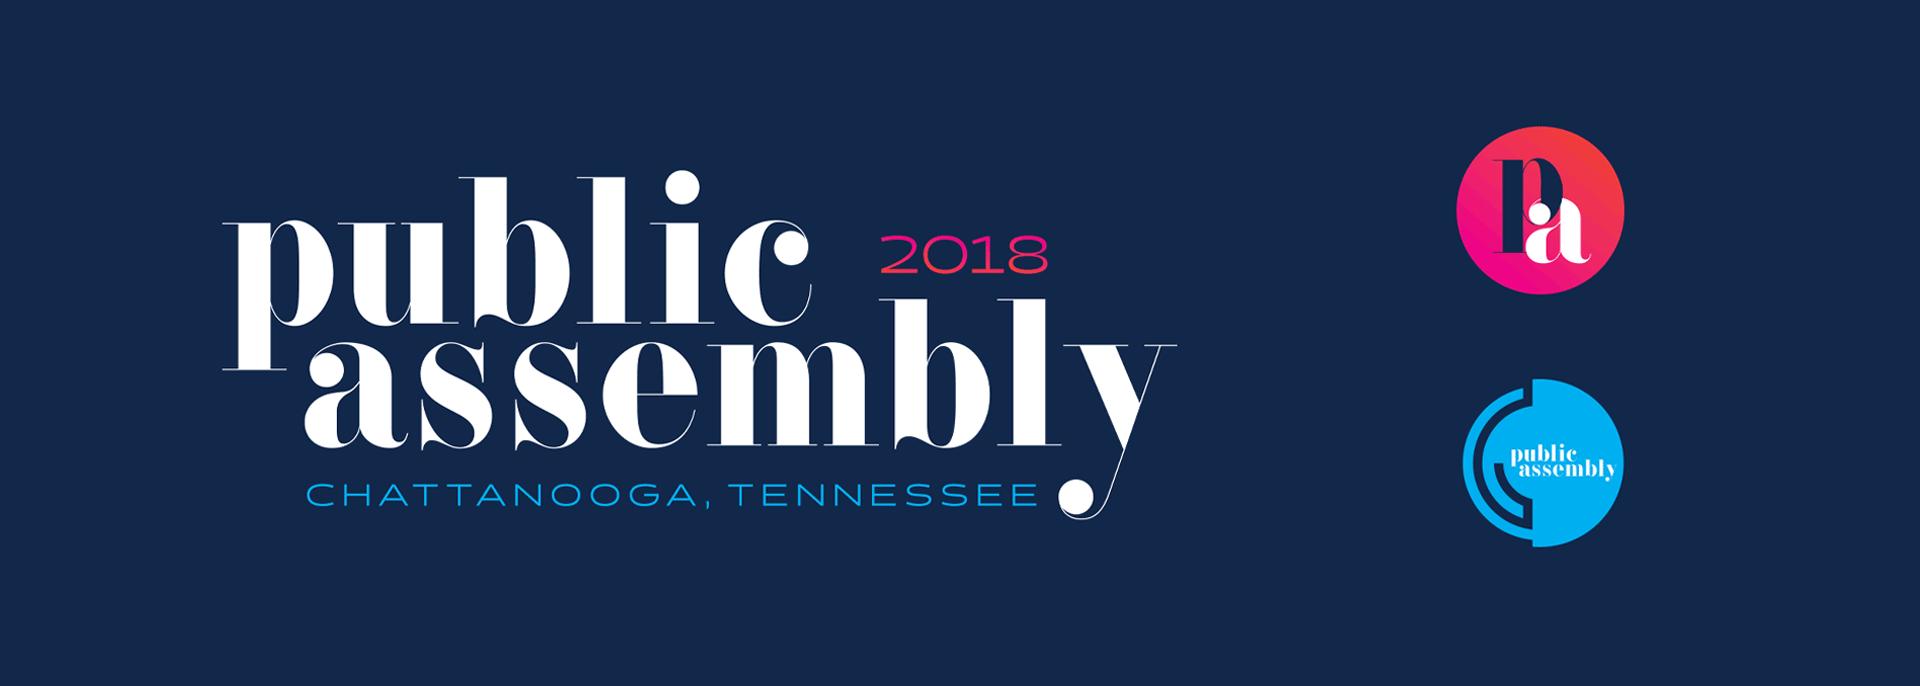 Public Assembly - Branding, Identity Design, Logo Design